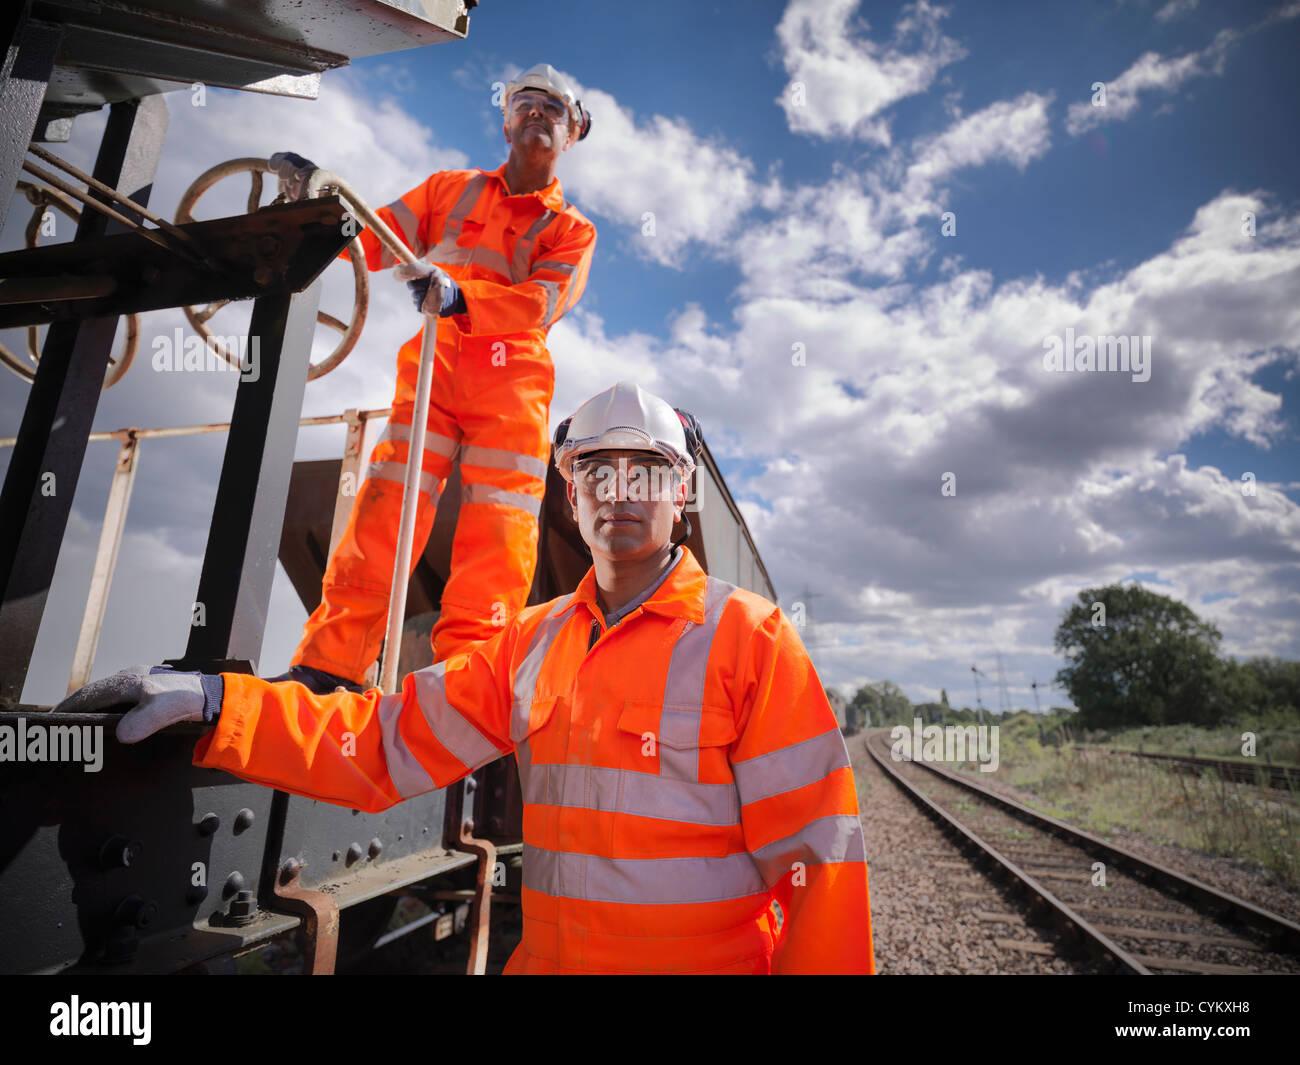 Railway workers standing on train - Stock Image